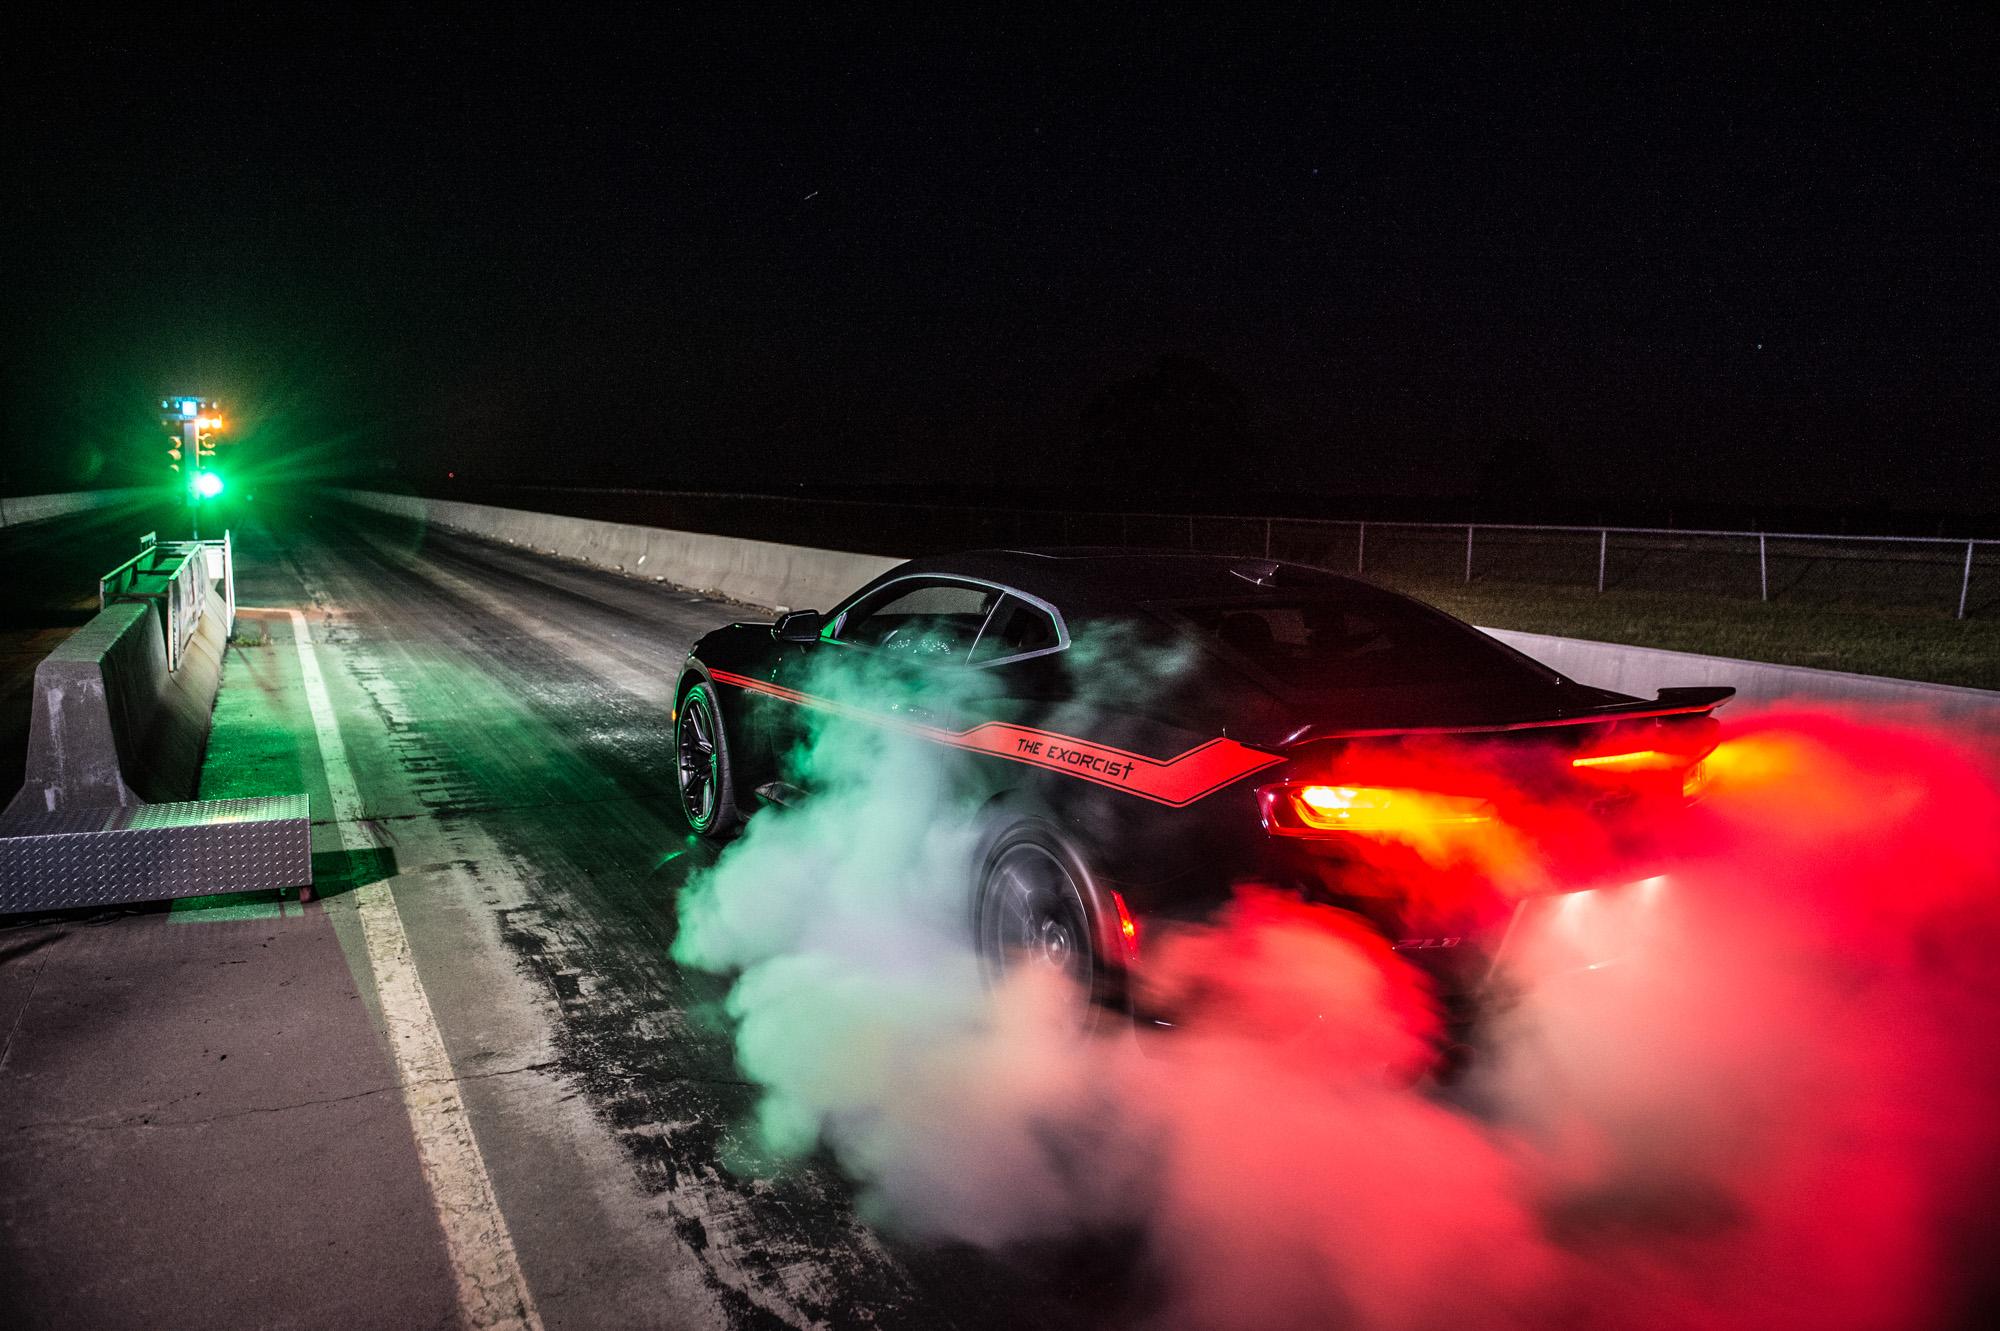 The Exorcist Hennessey Camaro ZL1 - 2017 - rear light